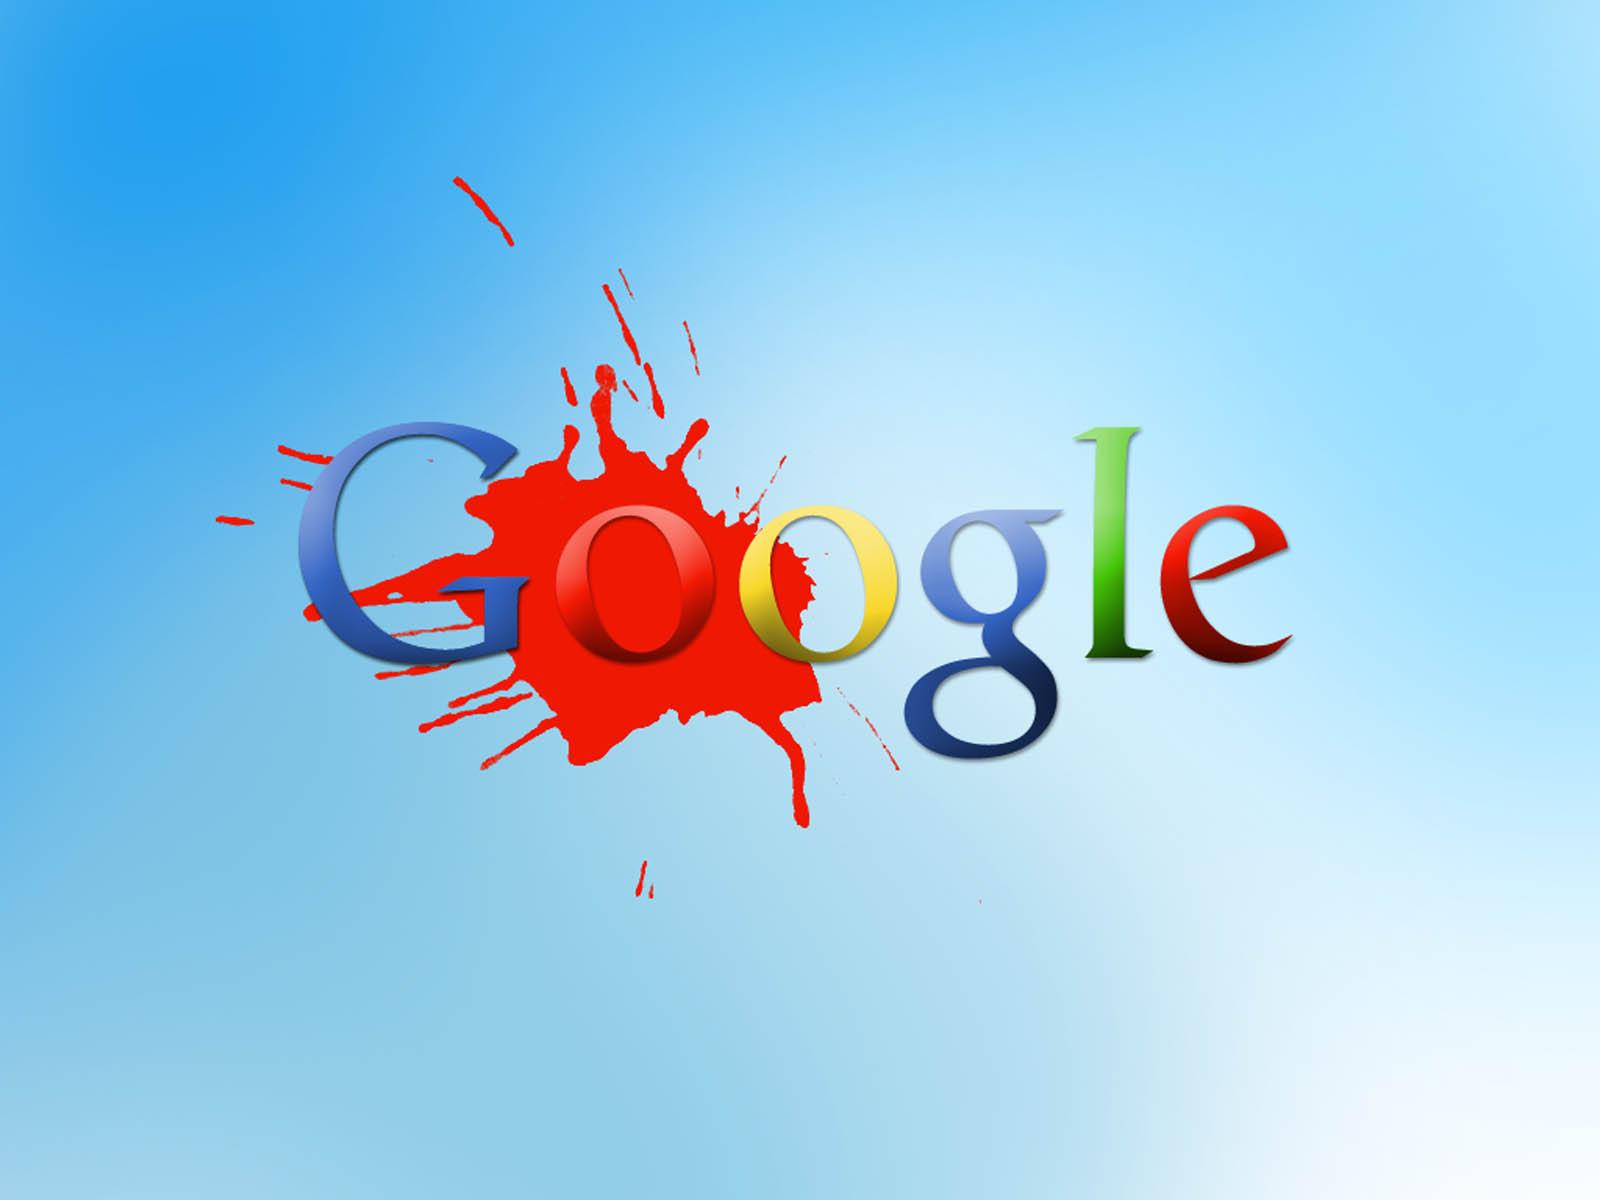 google desktop backgrounds and wallpapers best wallpaper